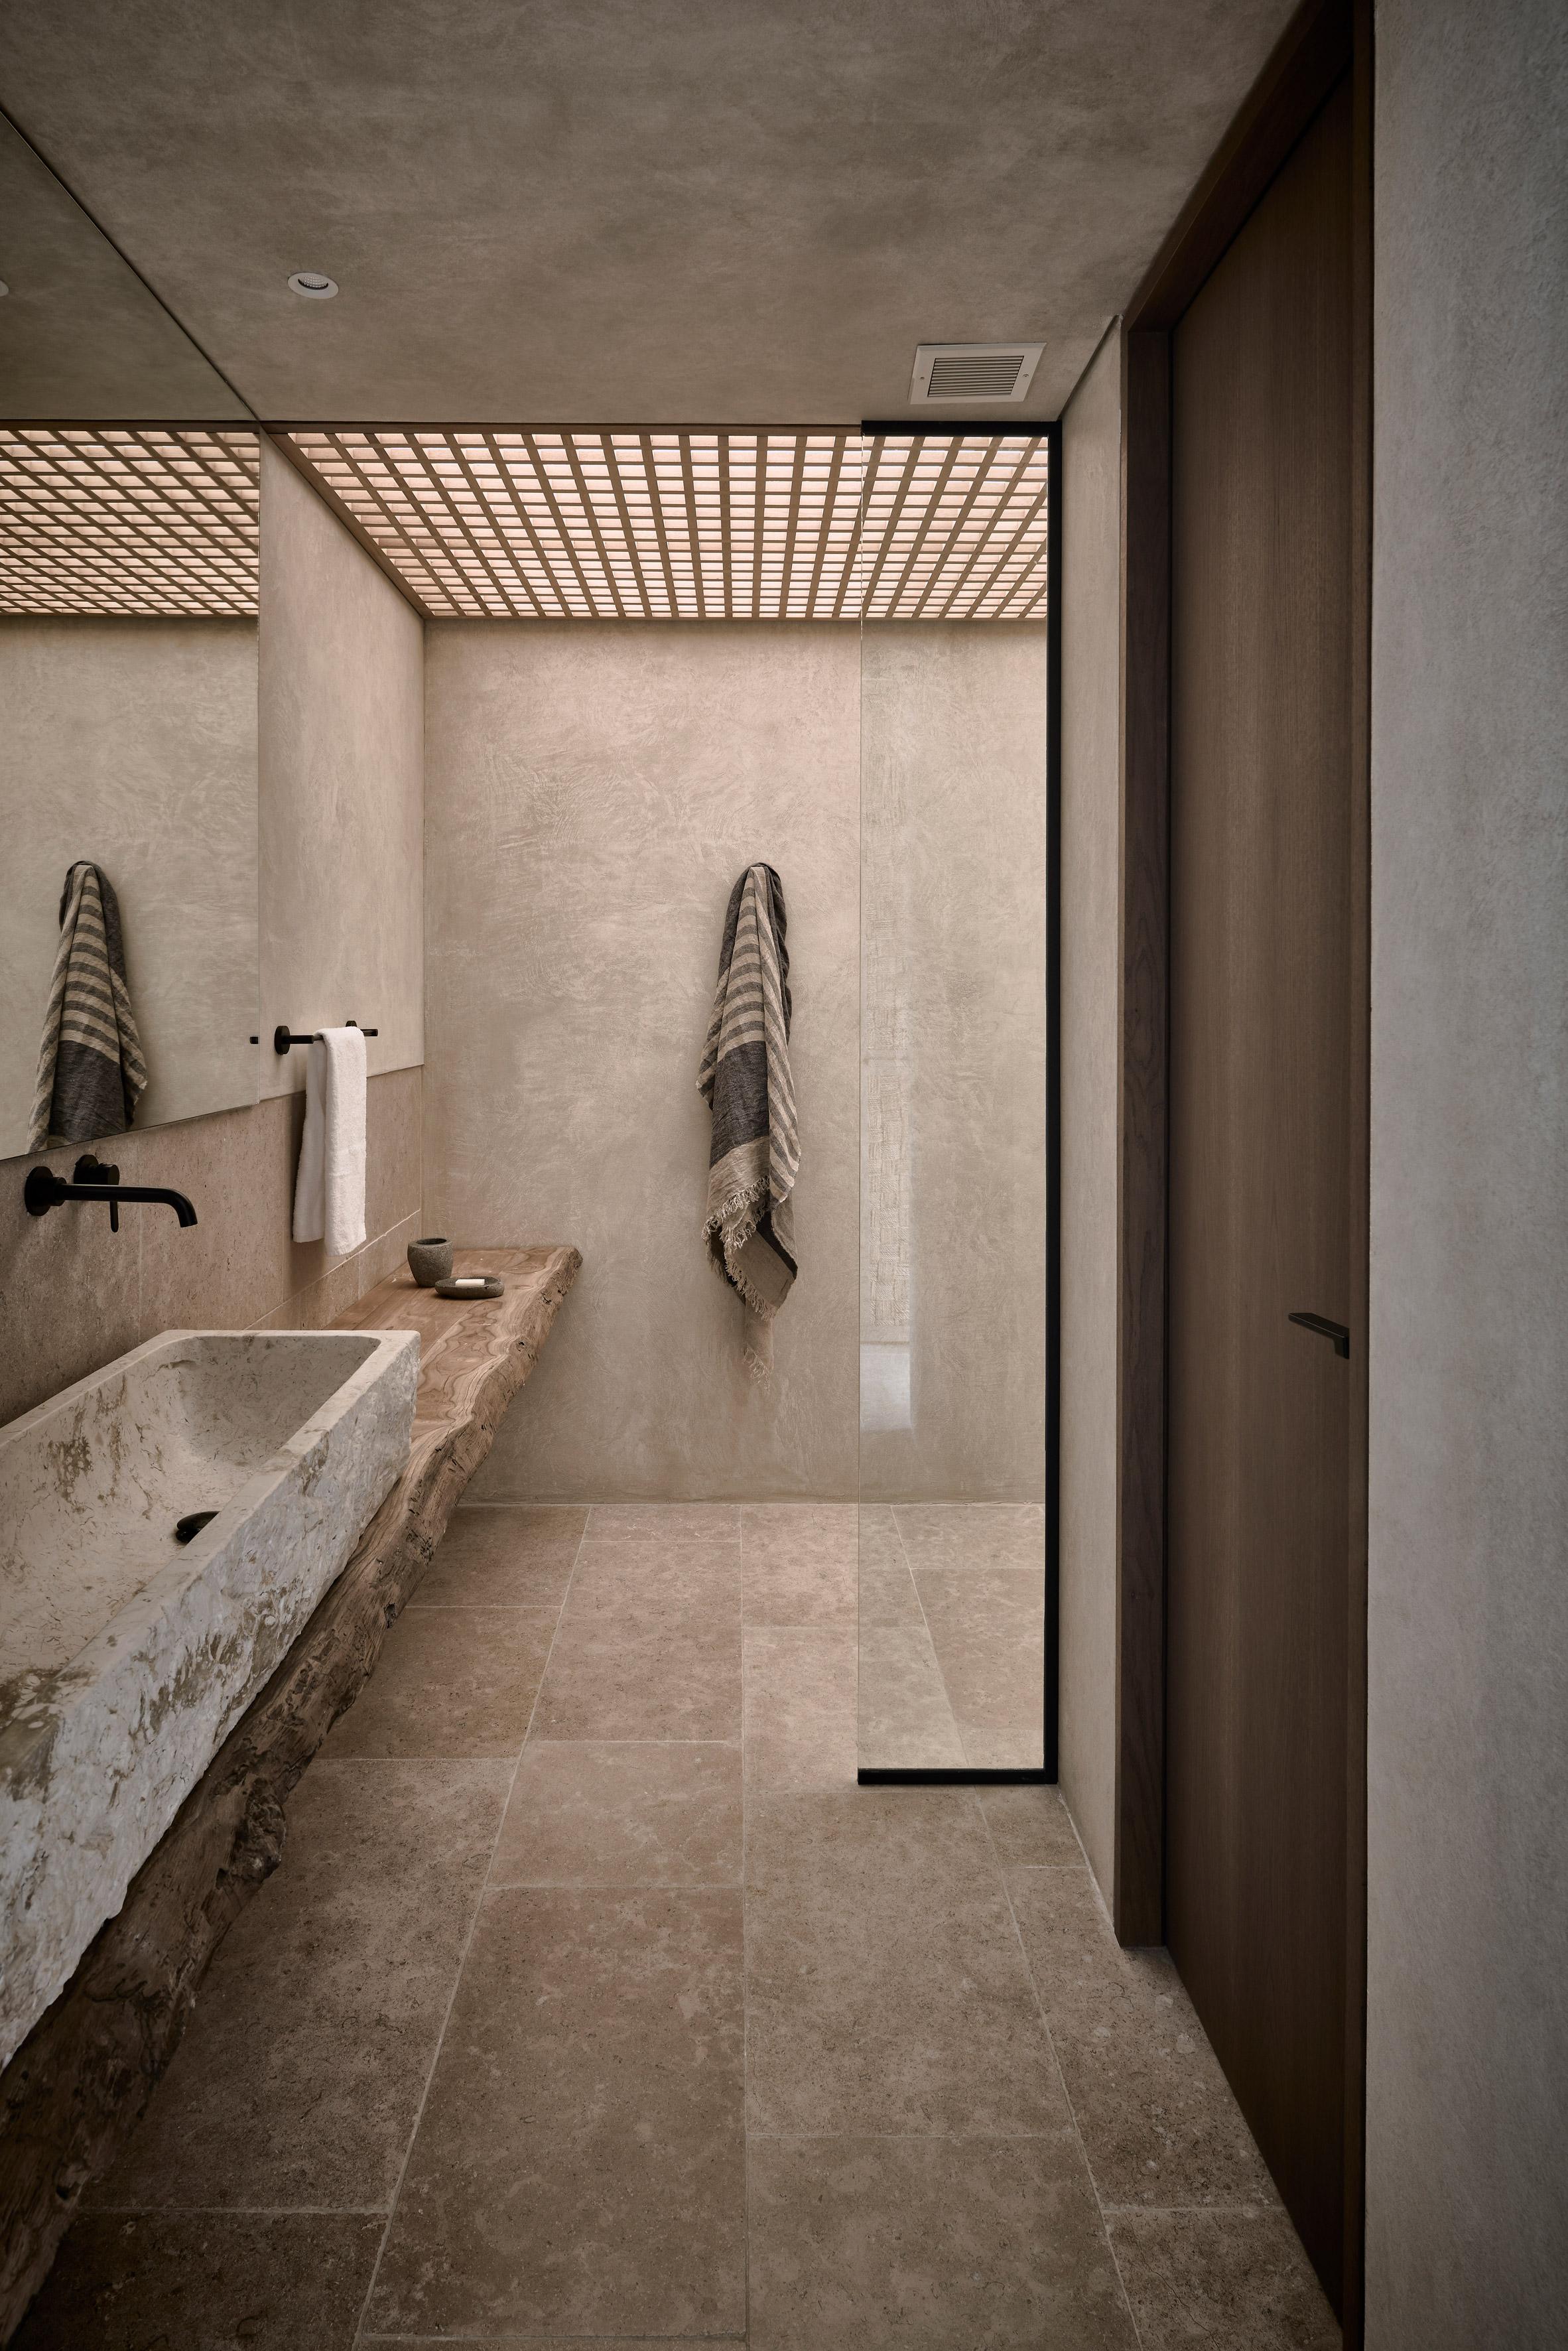 nội thất khách sạn olea-hotel-block722-elledecorationvn-relaxingspace-3